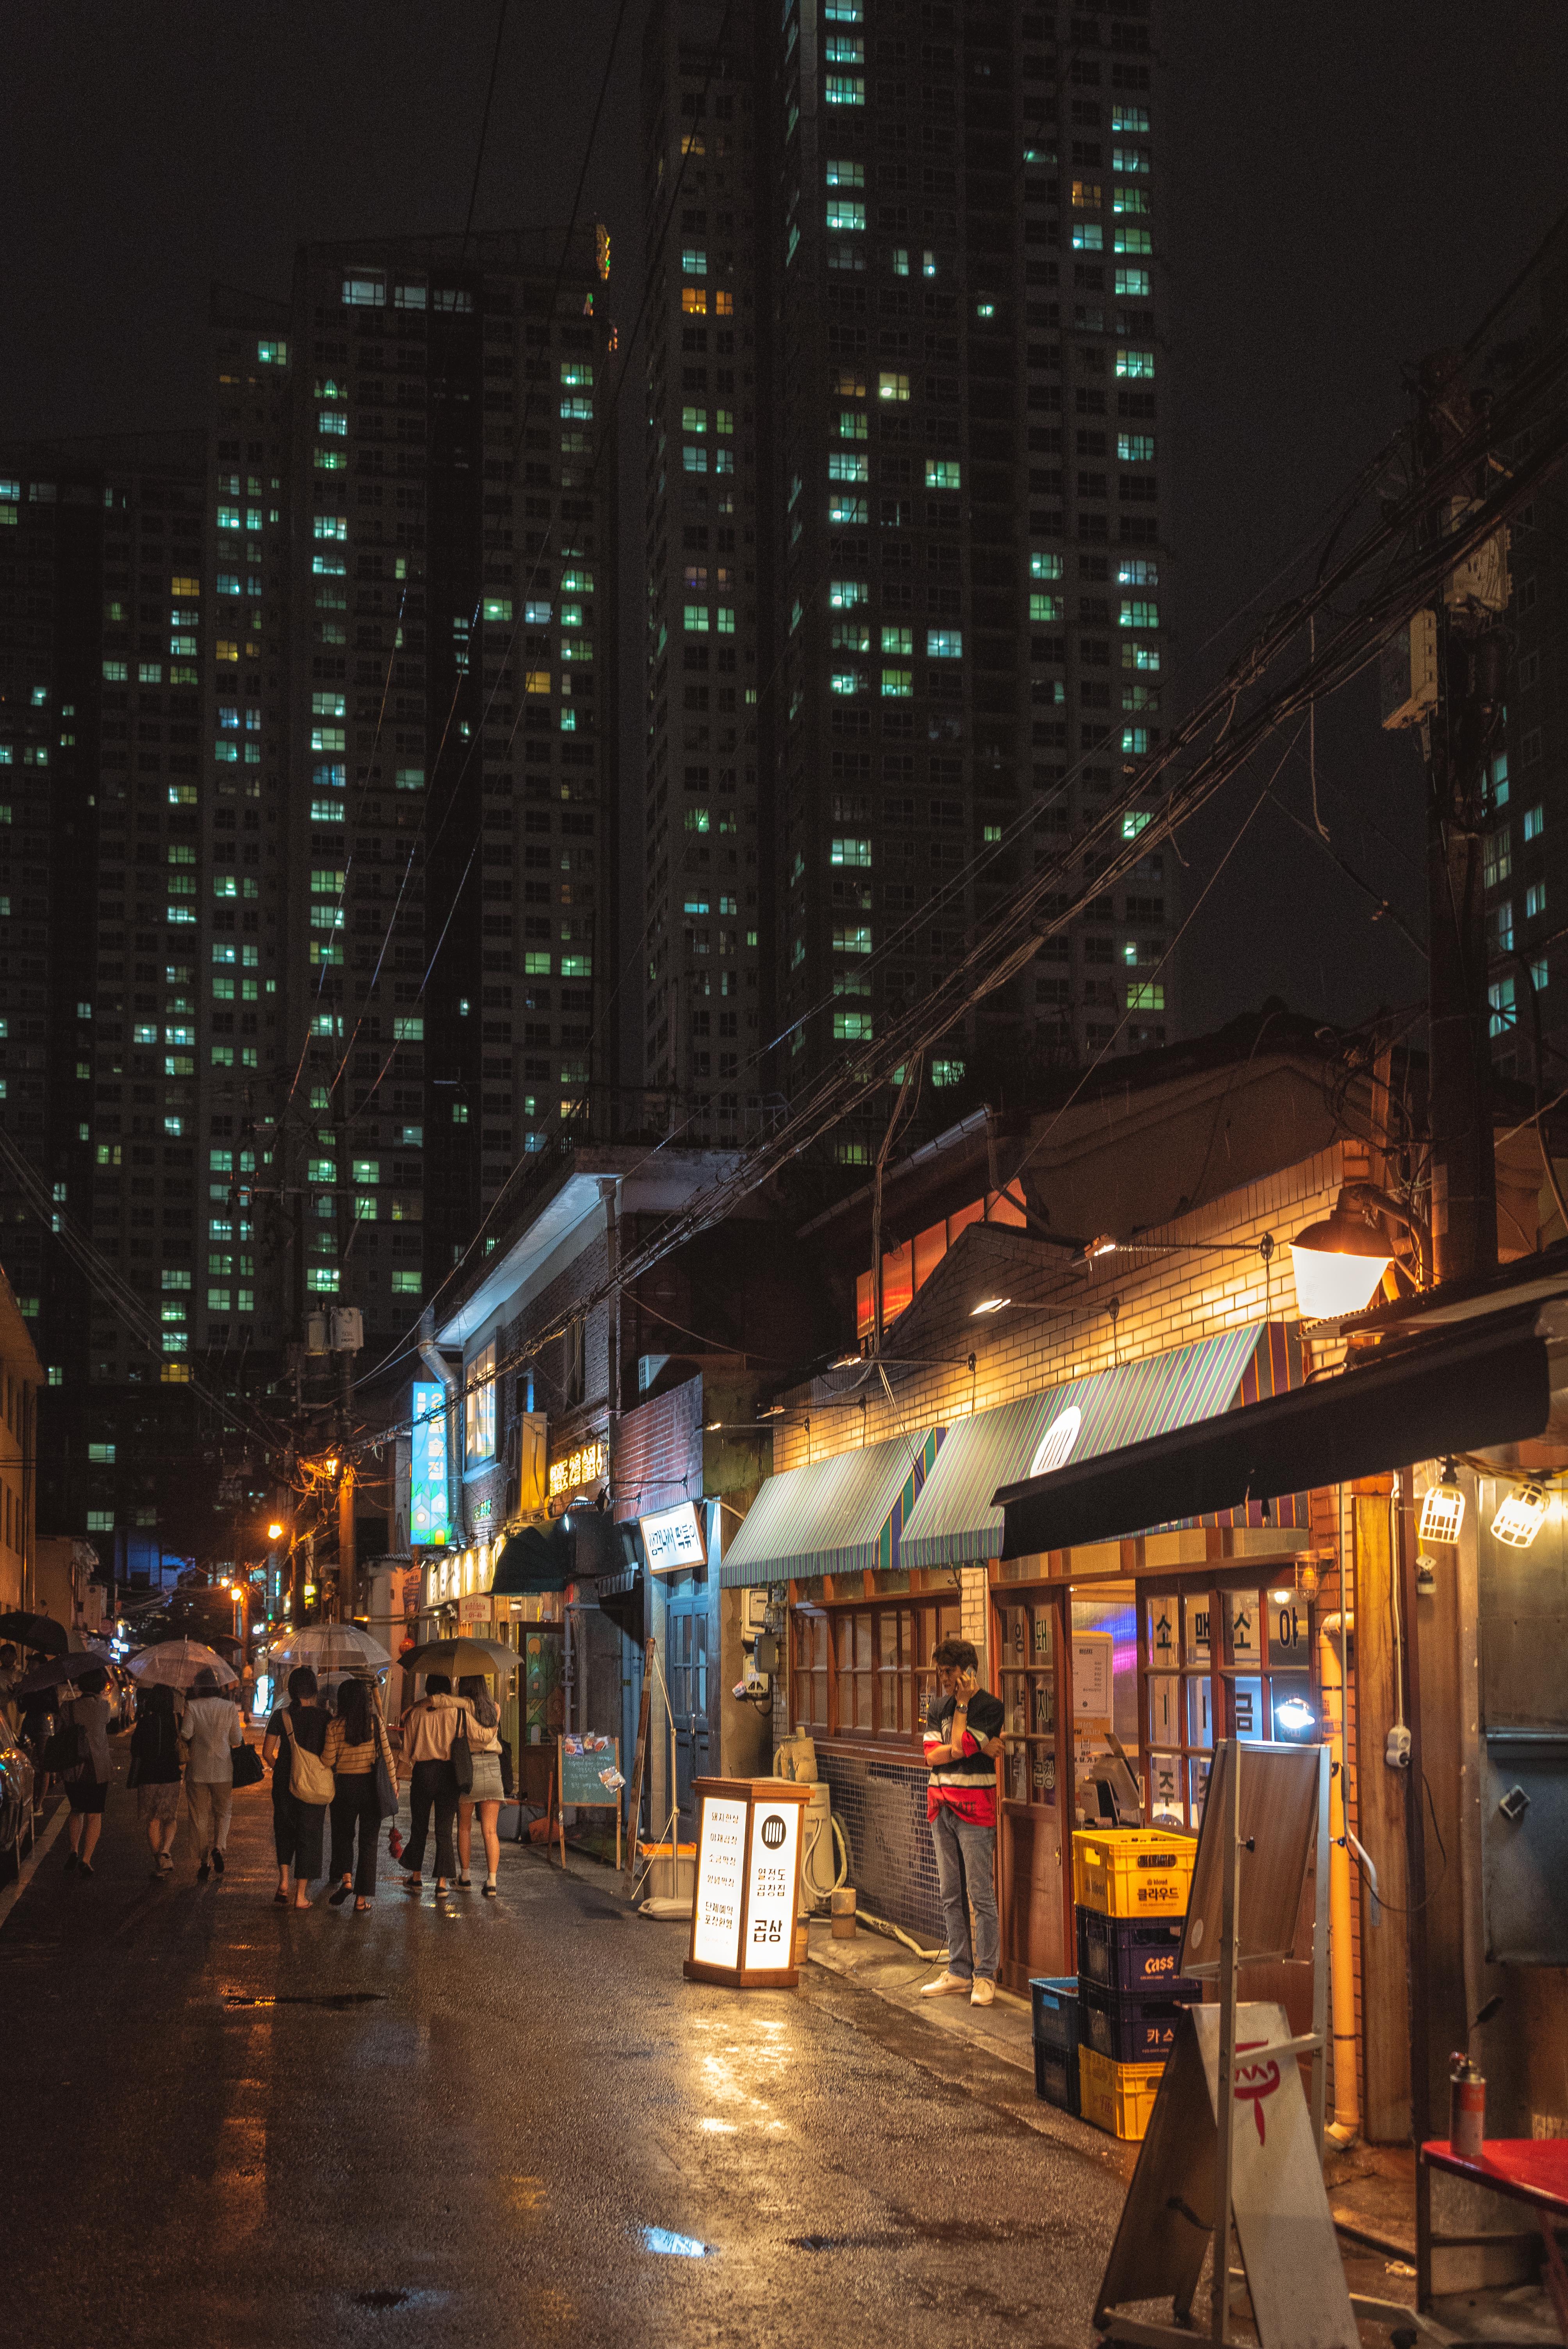 Street in Yongsan District at night, Seoul, South Korea [4016×6016]